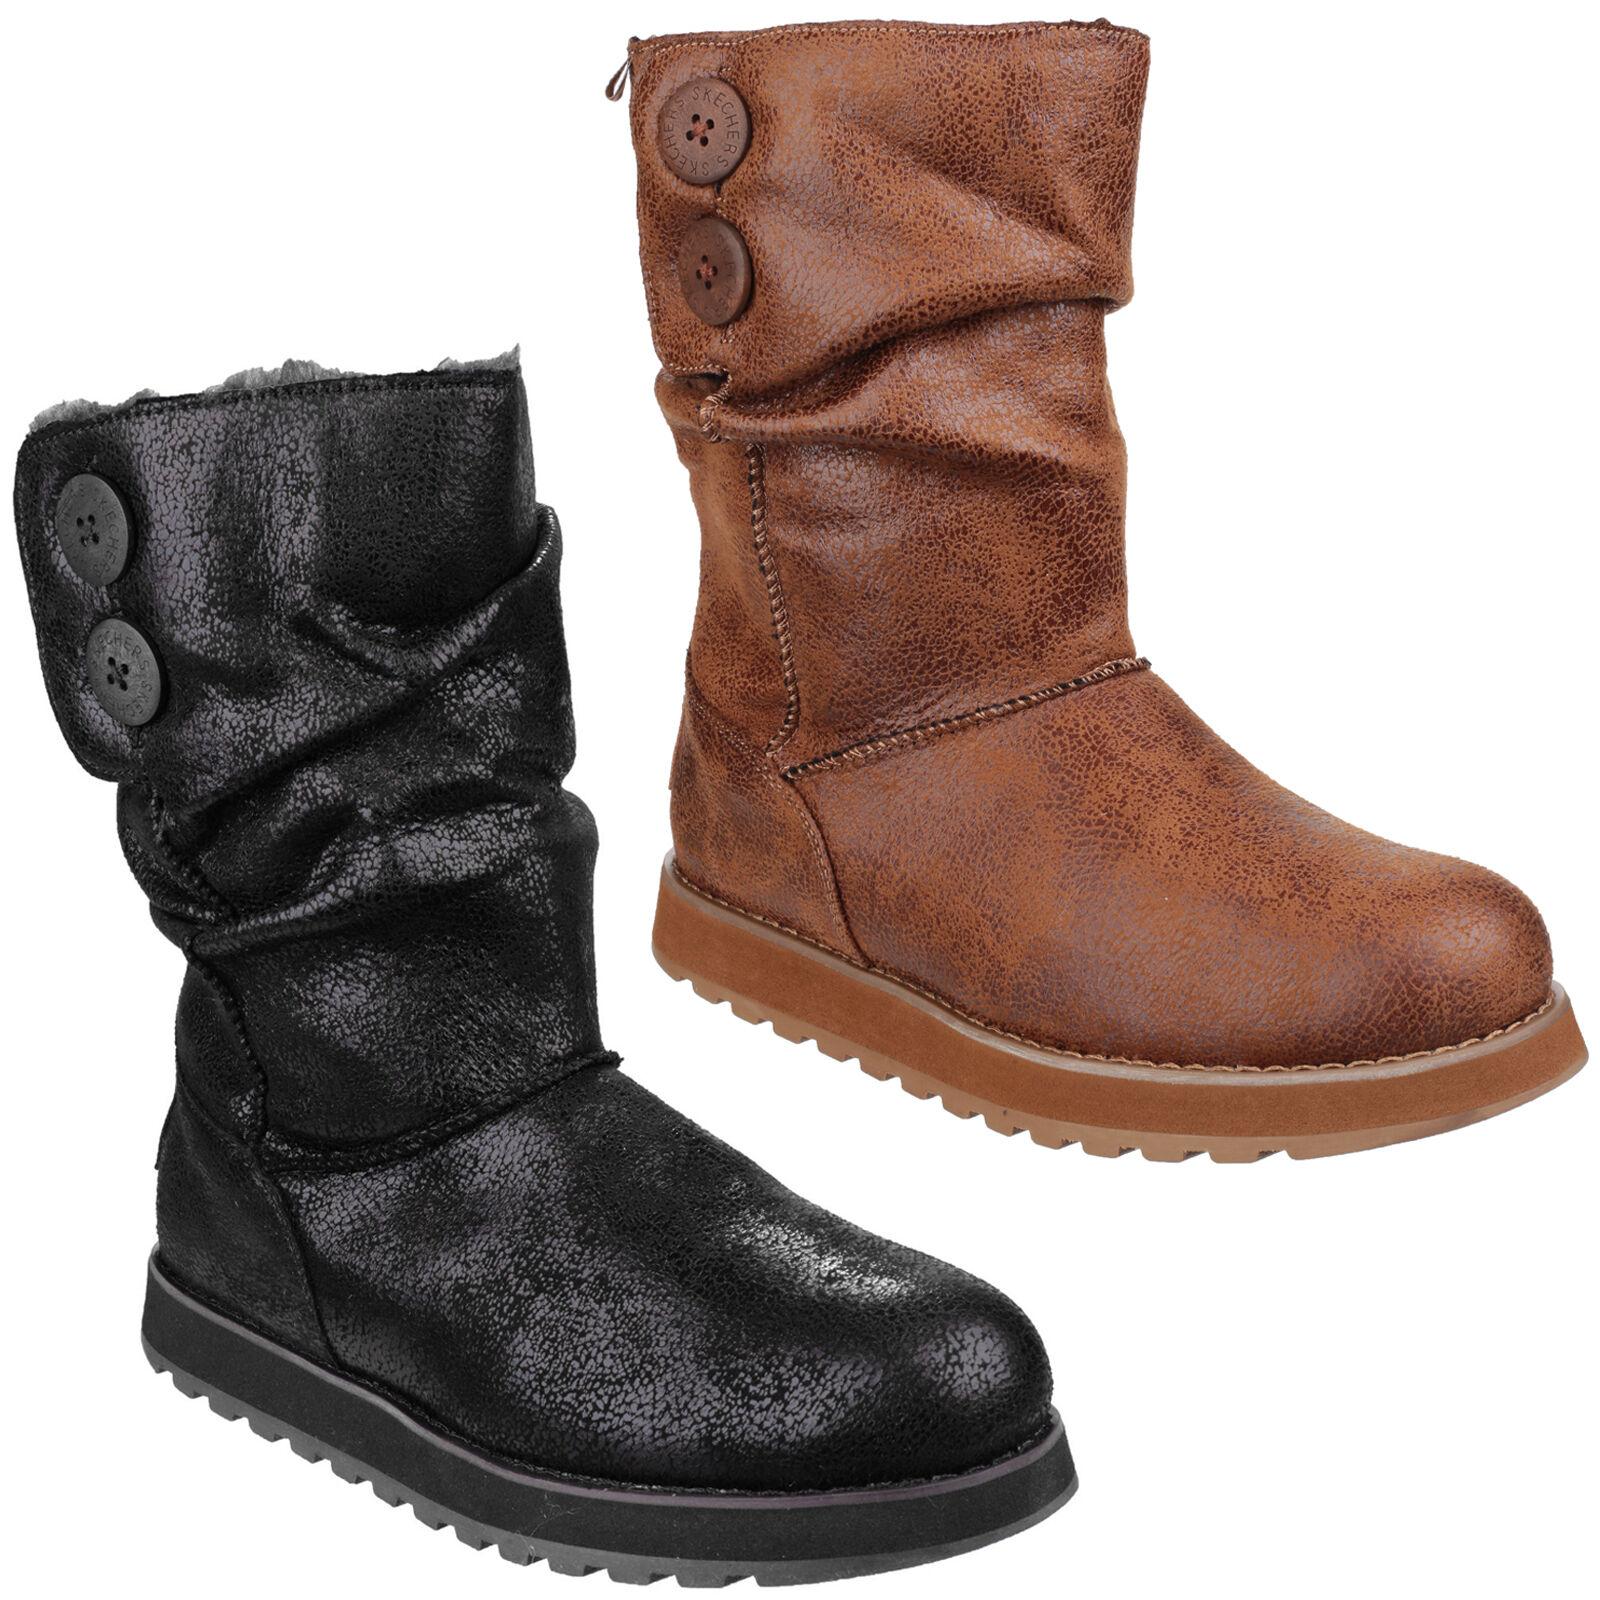 Skechers Keepsakes Esque femmes Mid Calf Memory Foam bottes UK3-8